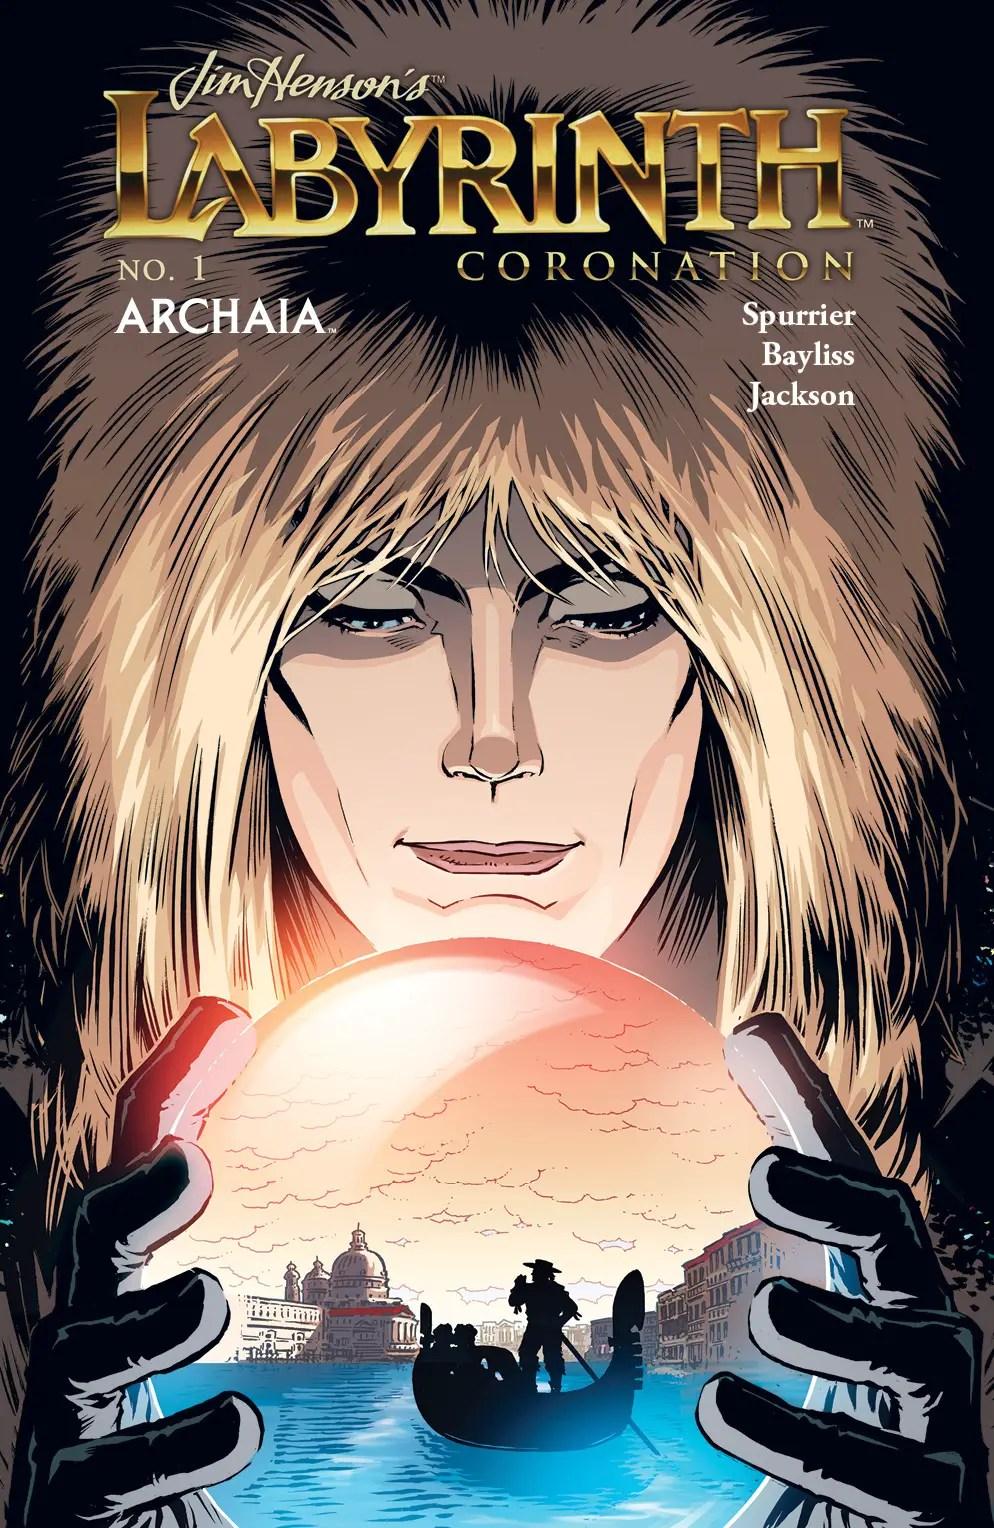 Jim Henson's Labyrinth: Coronation #1 Review